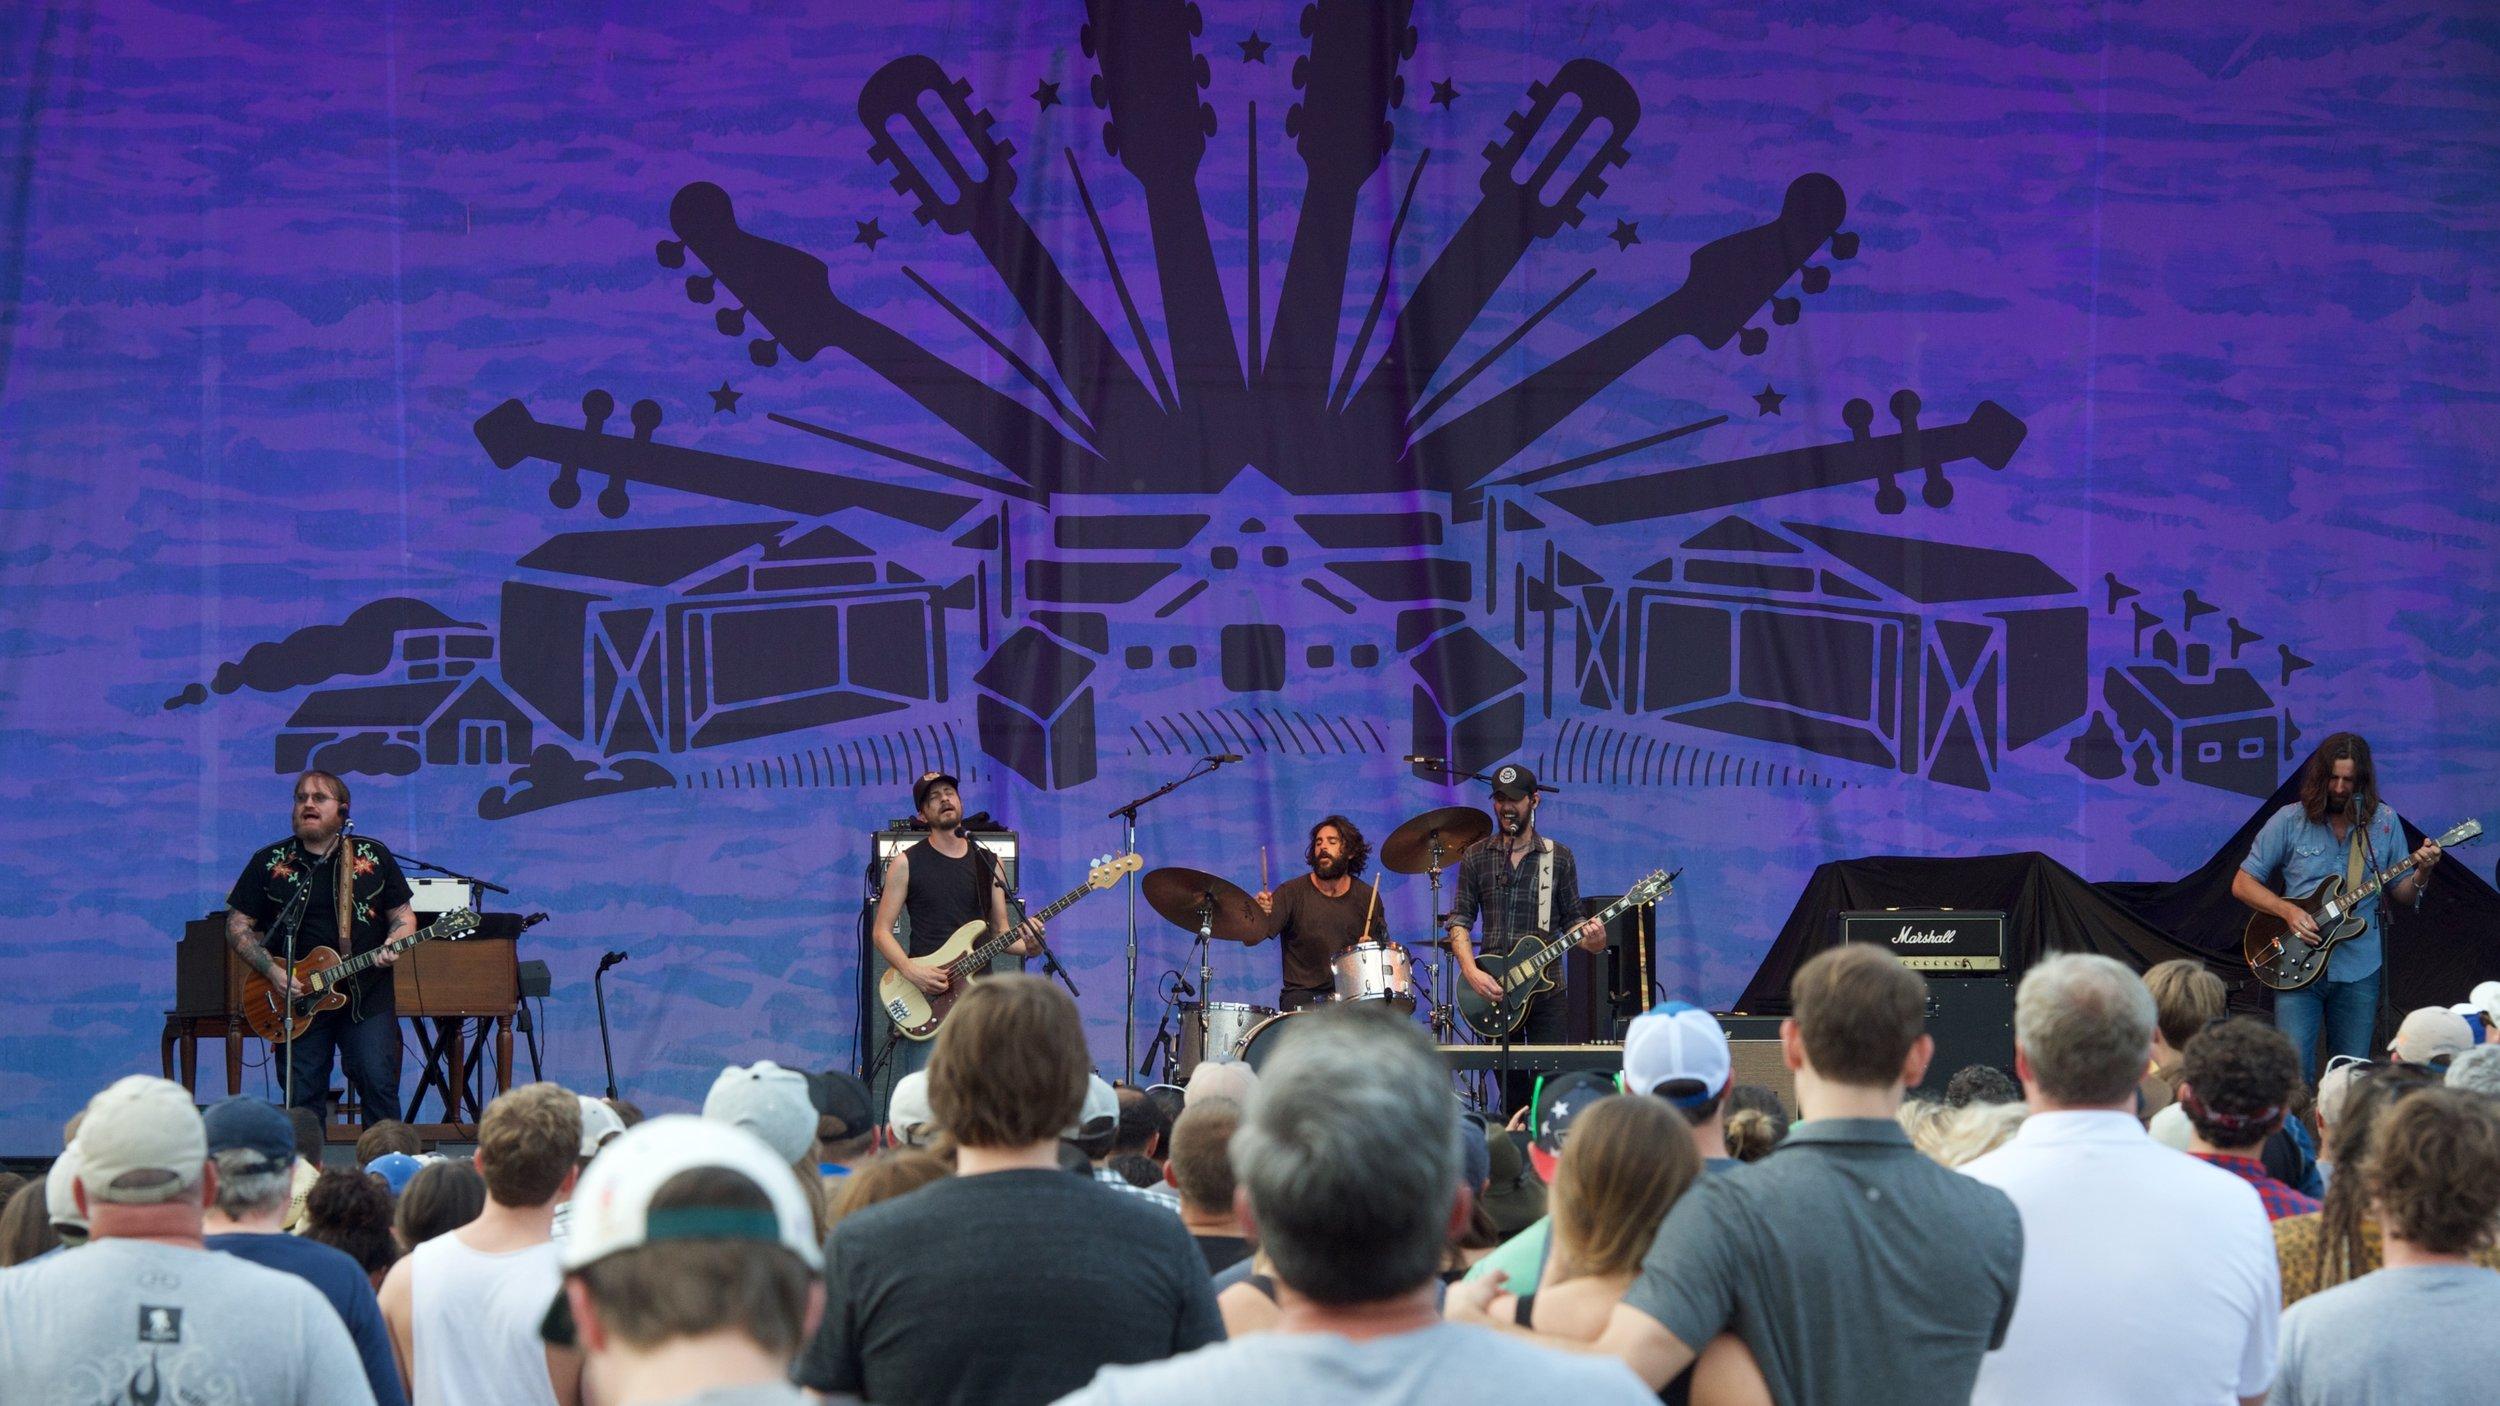 The Pilgrimage Music Festival Franklin, TN